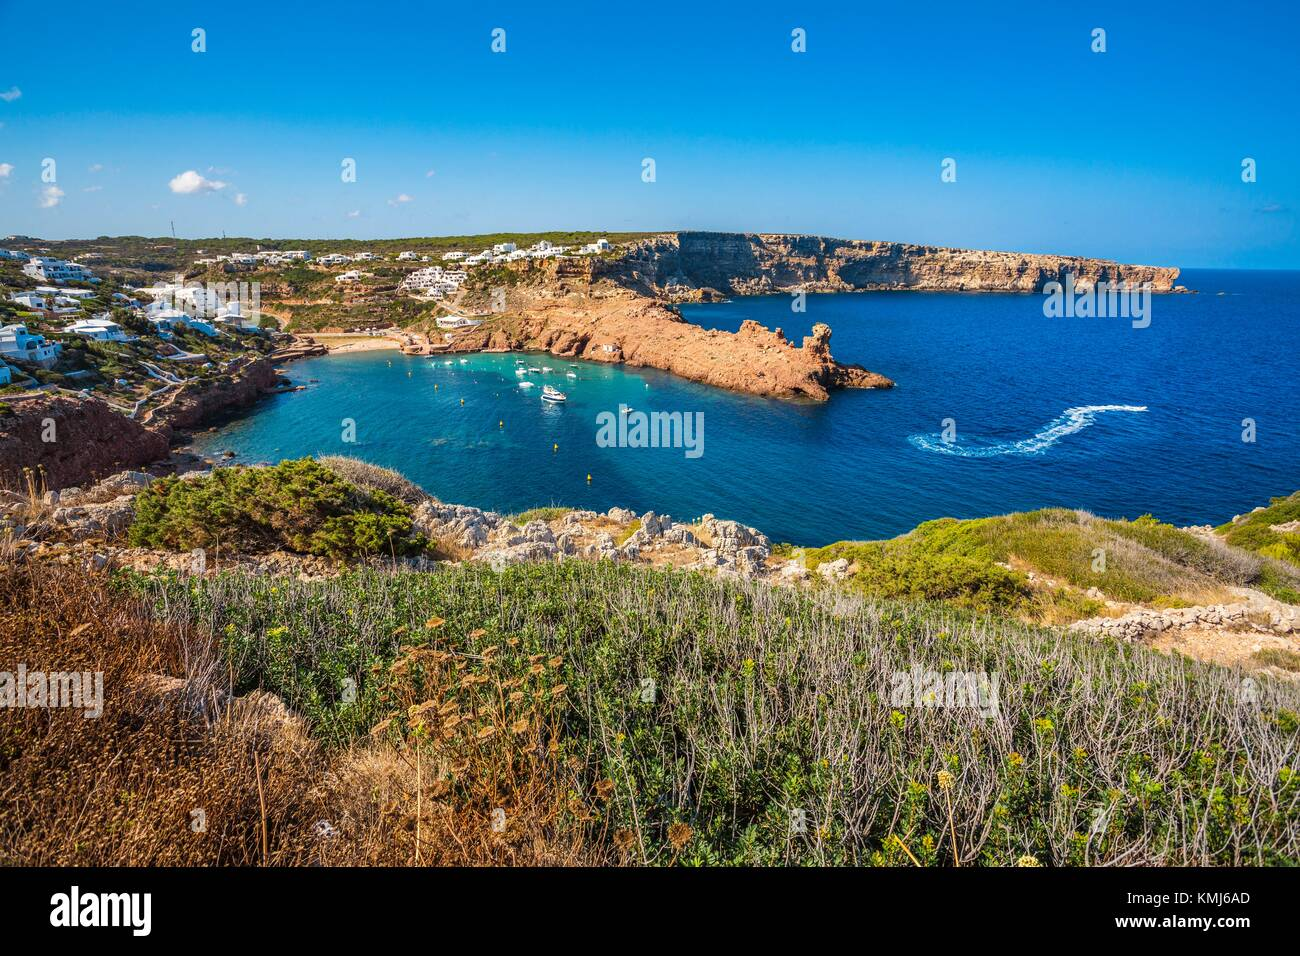 Cala Morell Bay. Ciutadella de Menorca Municipality. Minorca. Balearic Islands. Spain - Stock Image